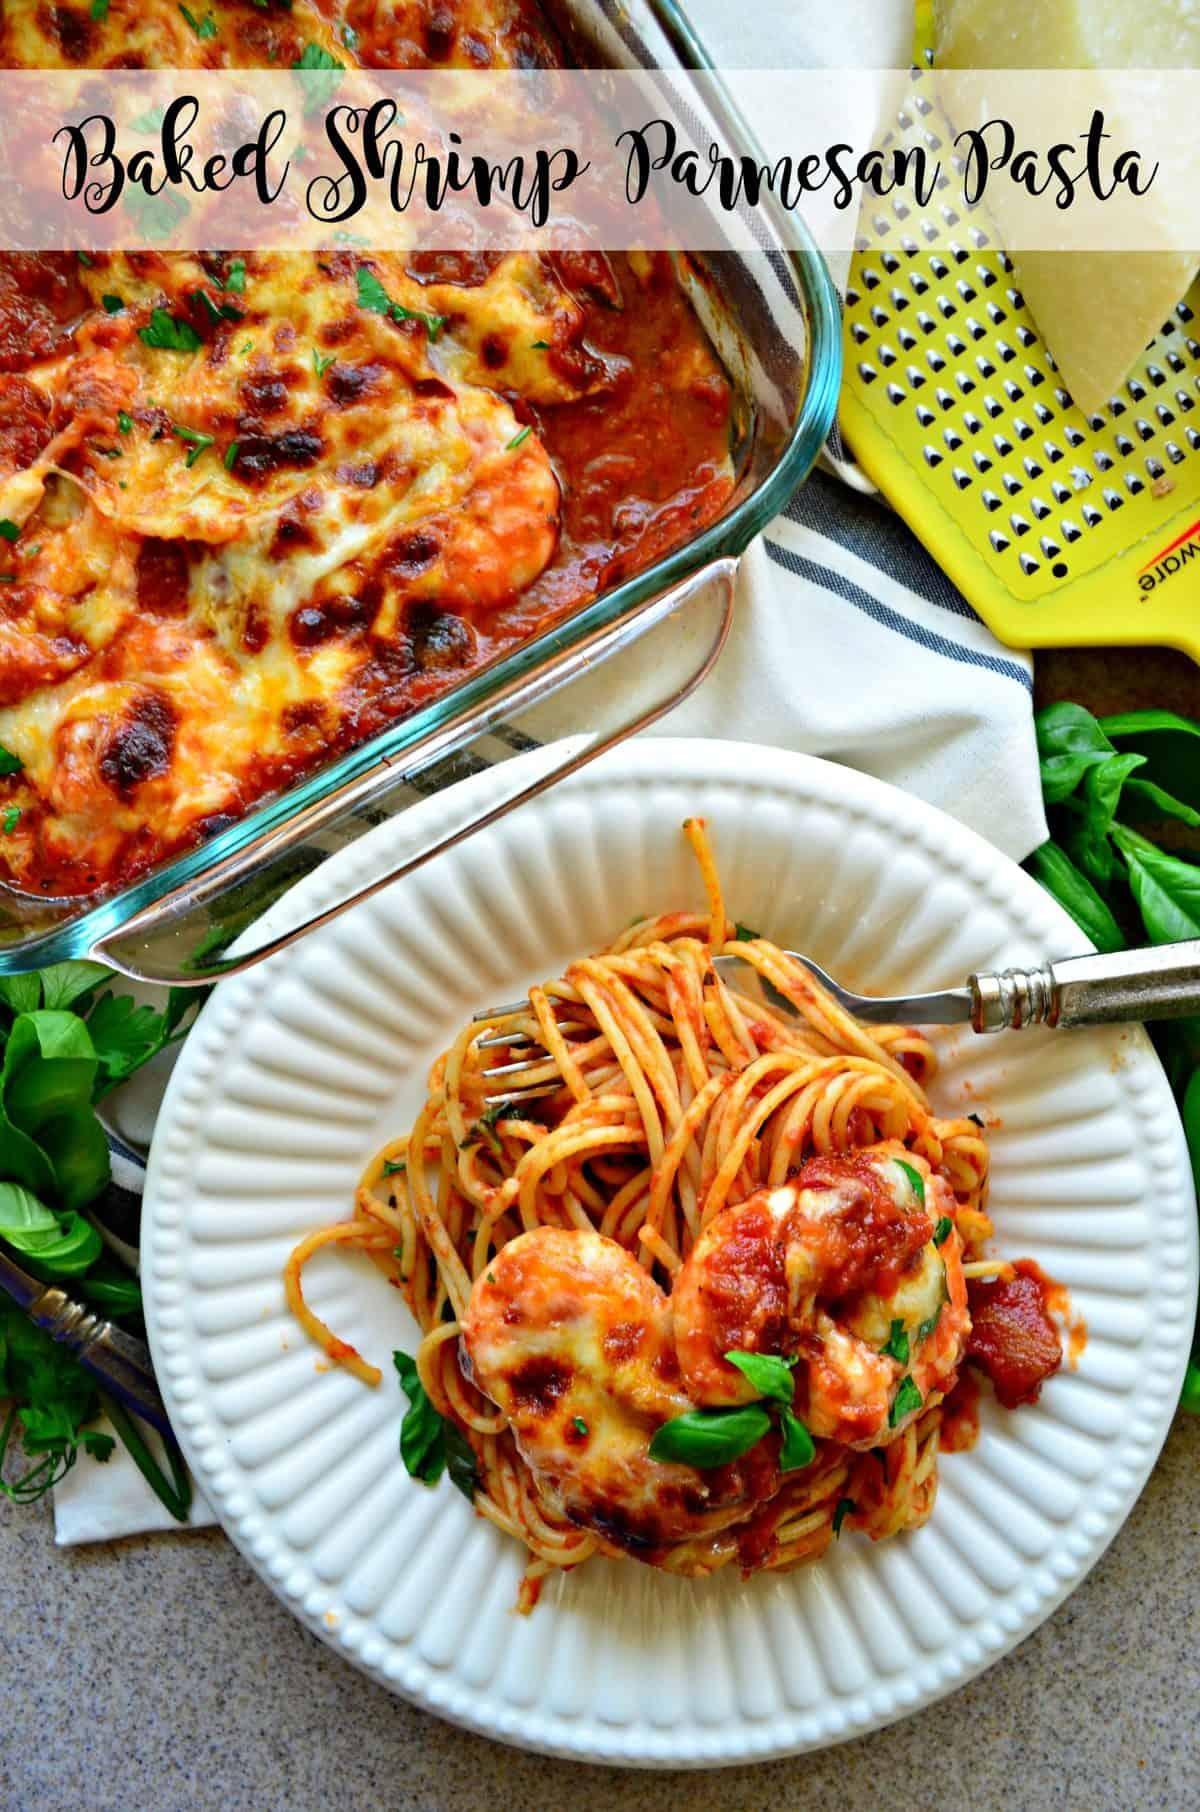 Baked Shrimp Parmesan Pasta #SimmeredInTradition #Ragu #Ad